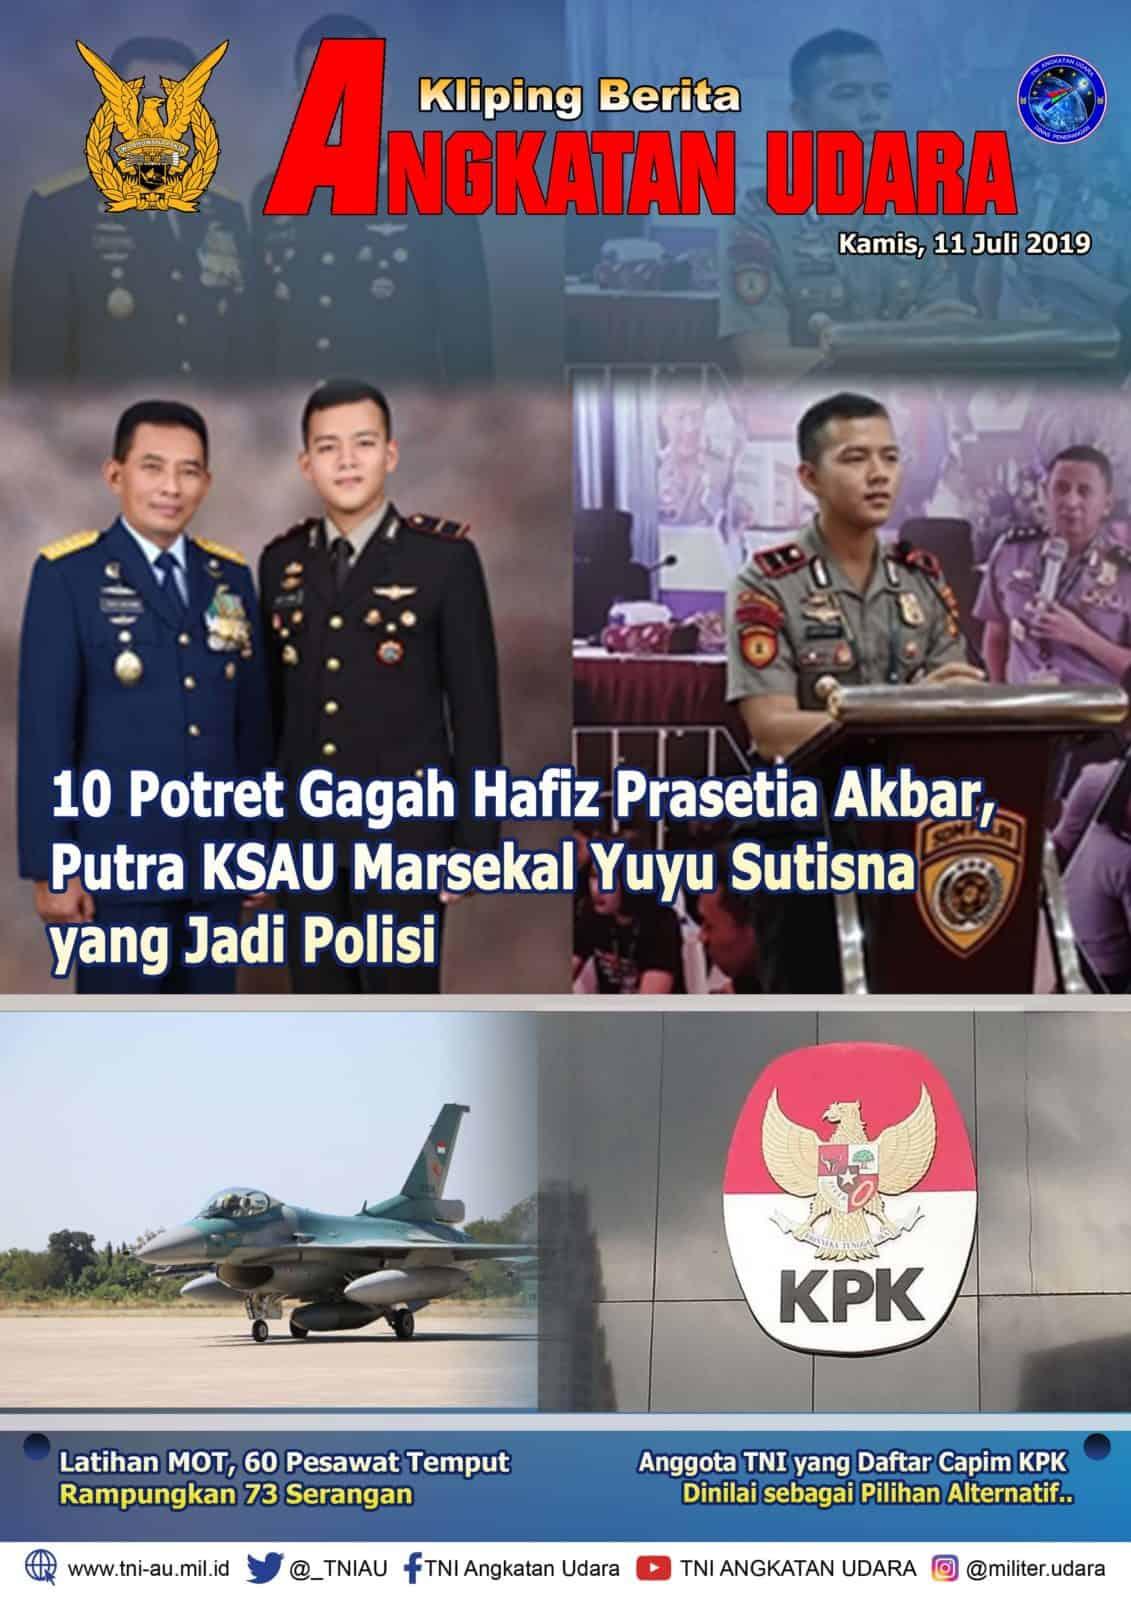 Kli[ing Berita Media 11 Juli 2019